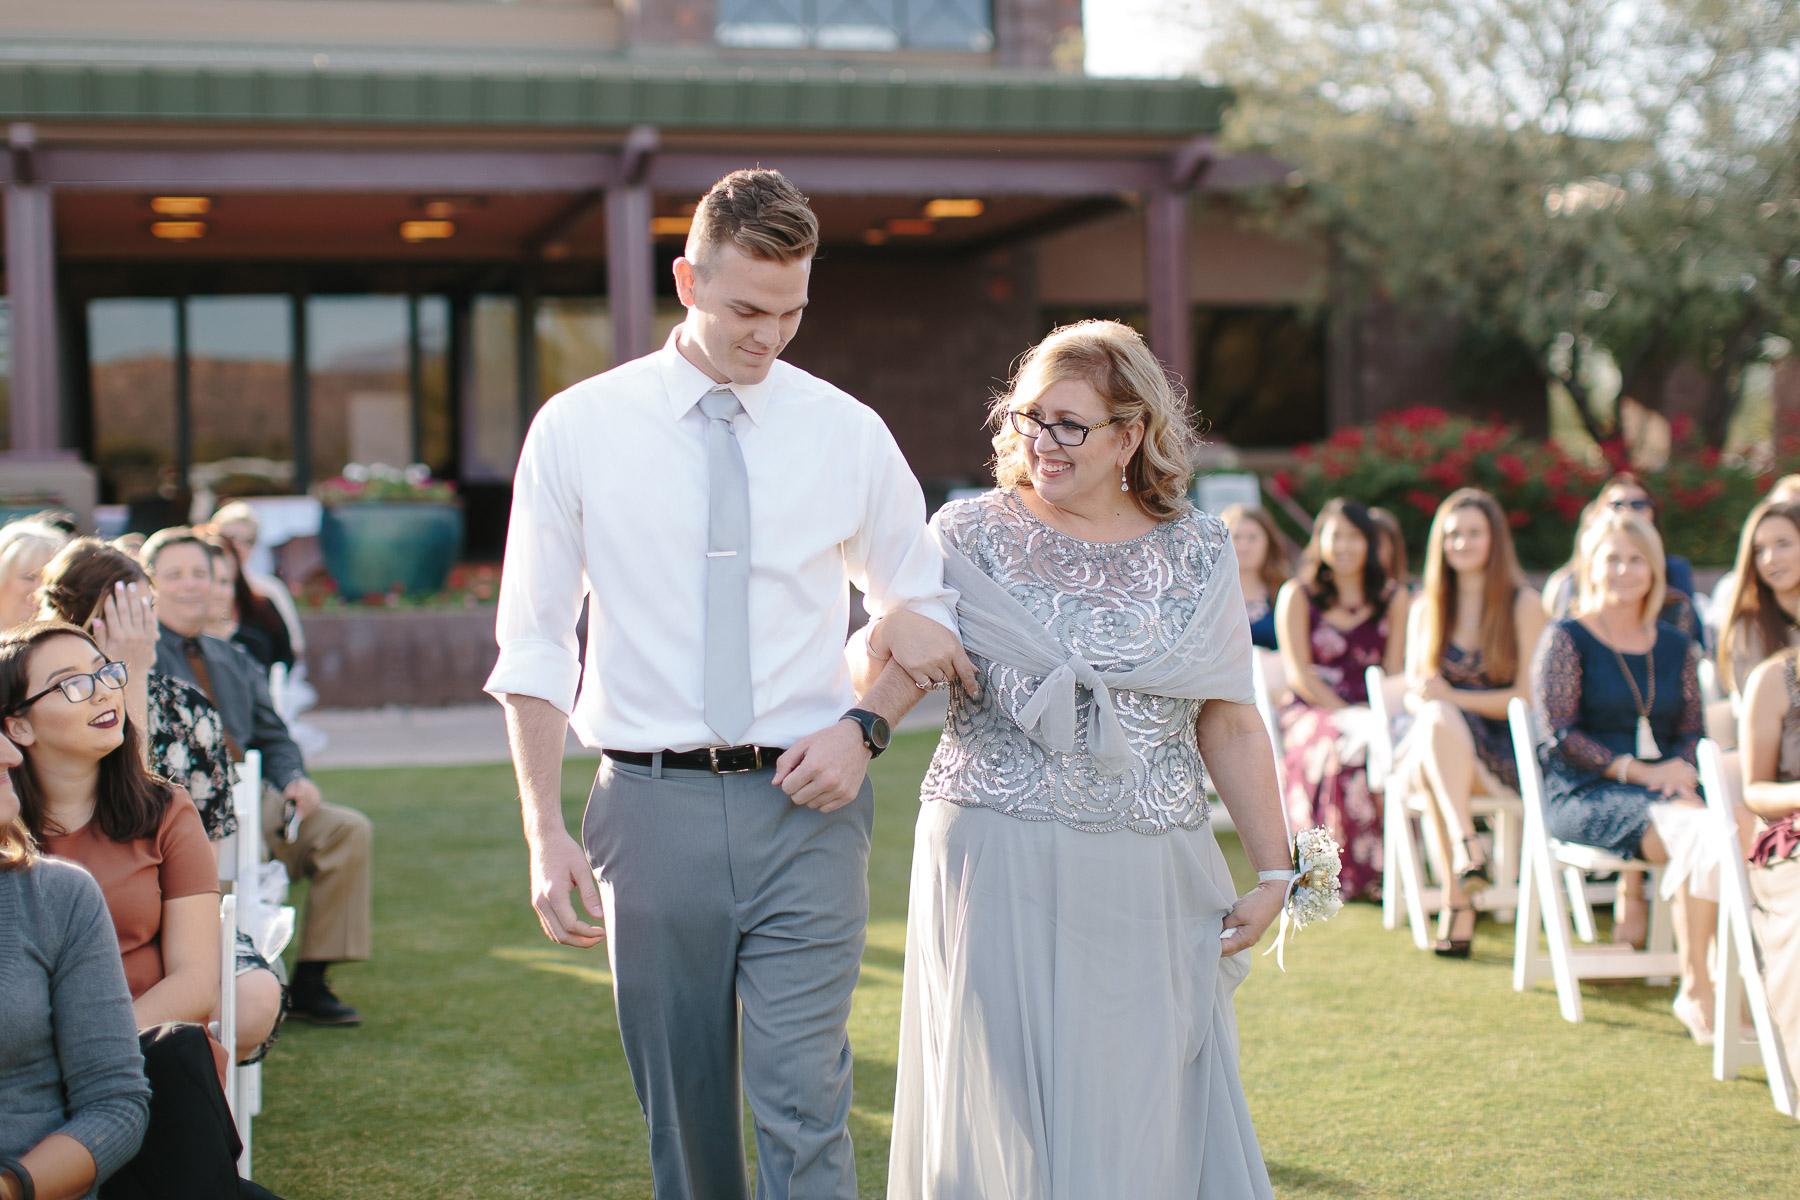 161210-Luxium-Weddings-Arizona-Matt-Jenny-Anthem-Golf-Country-Club-1021.jpg